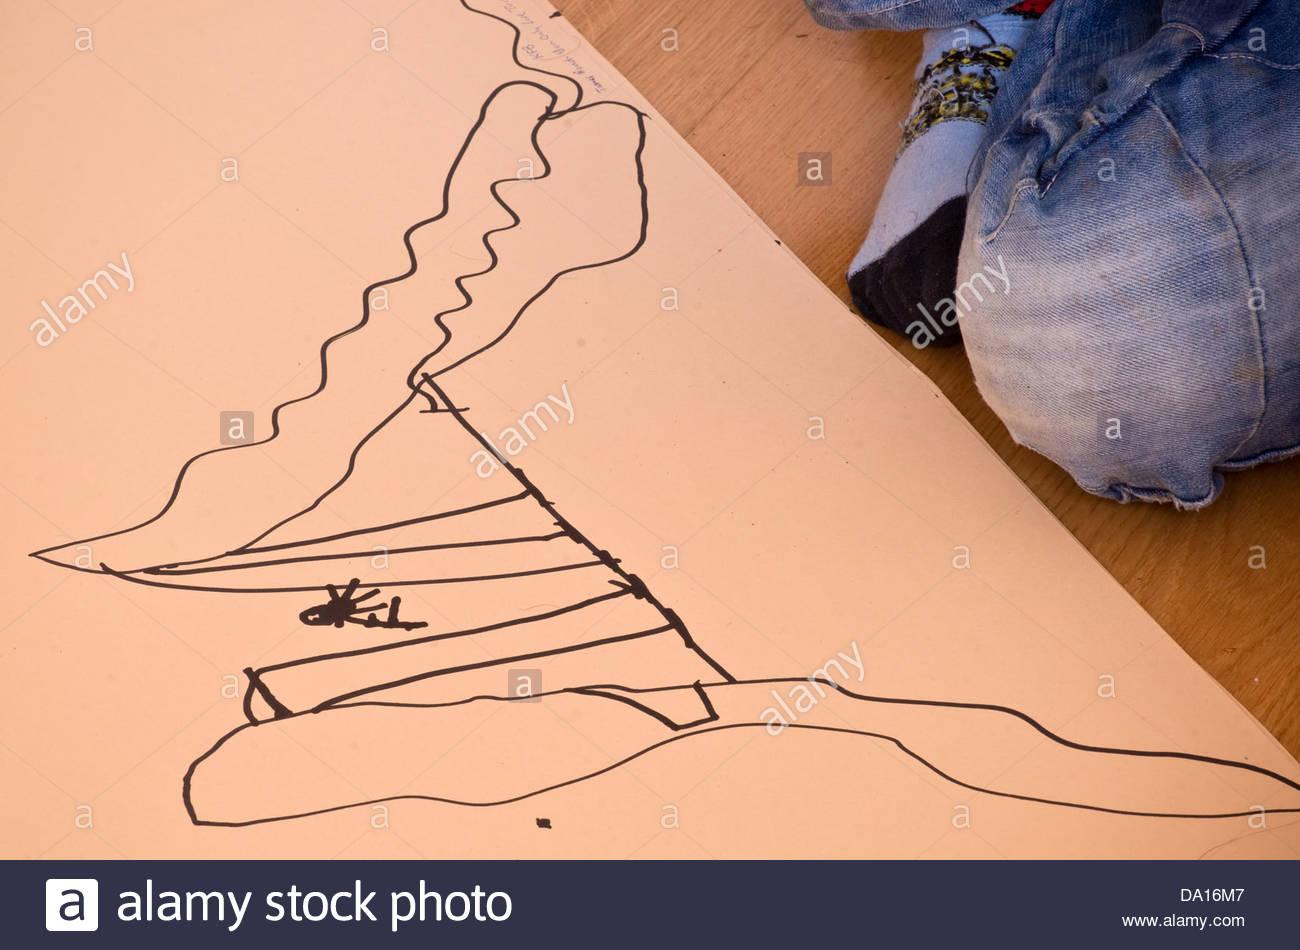 boy child children kids kid drawing art artist artwork - this is drawing of a James Bond crater man entering via - Stock Image